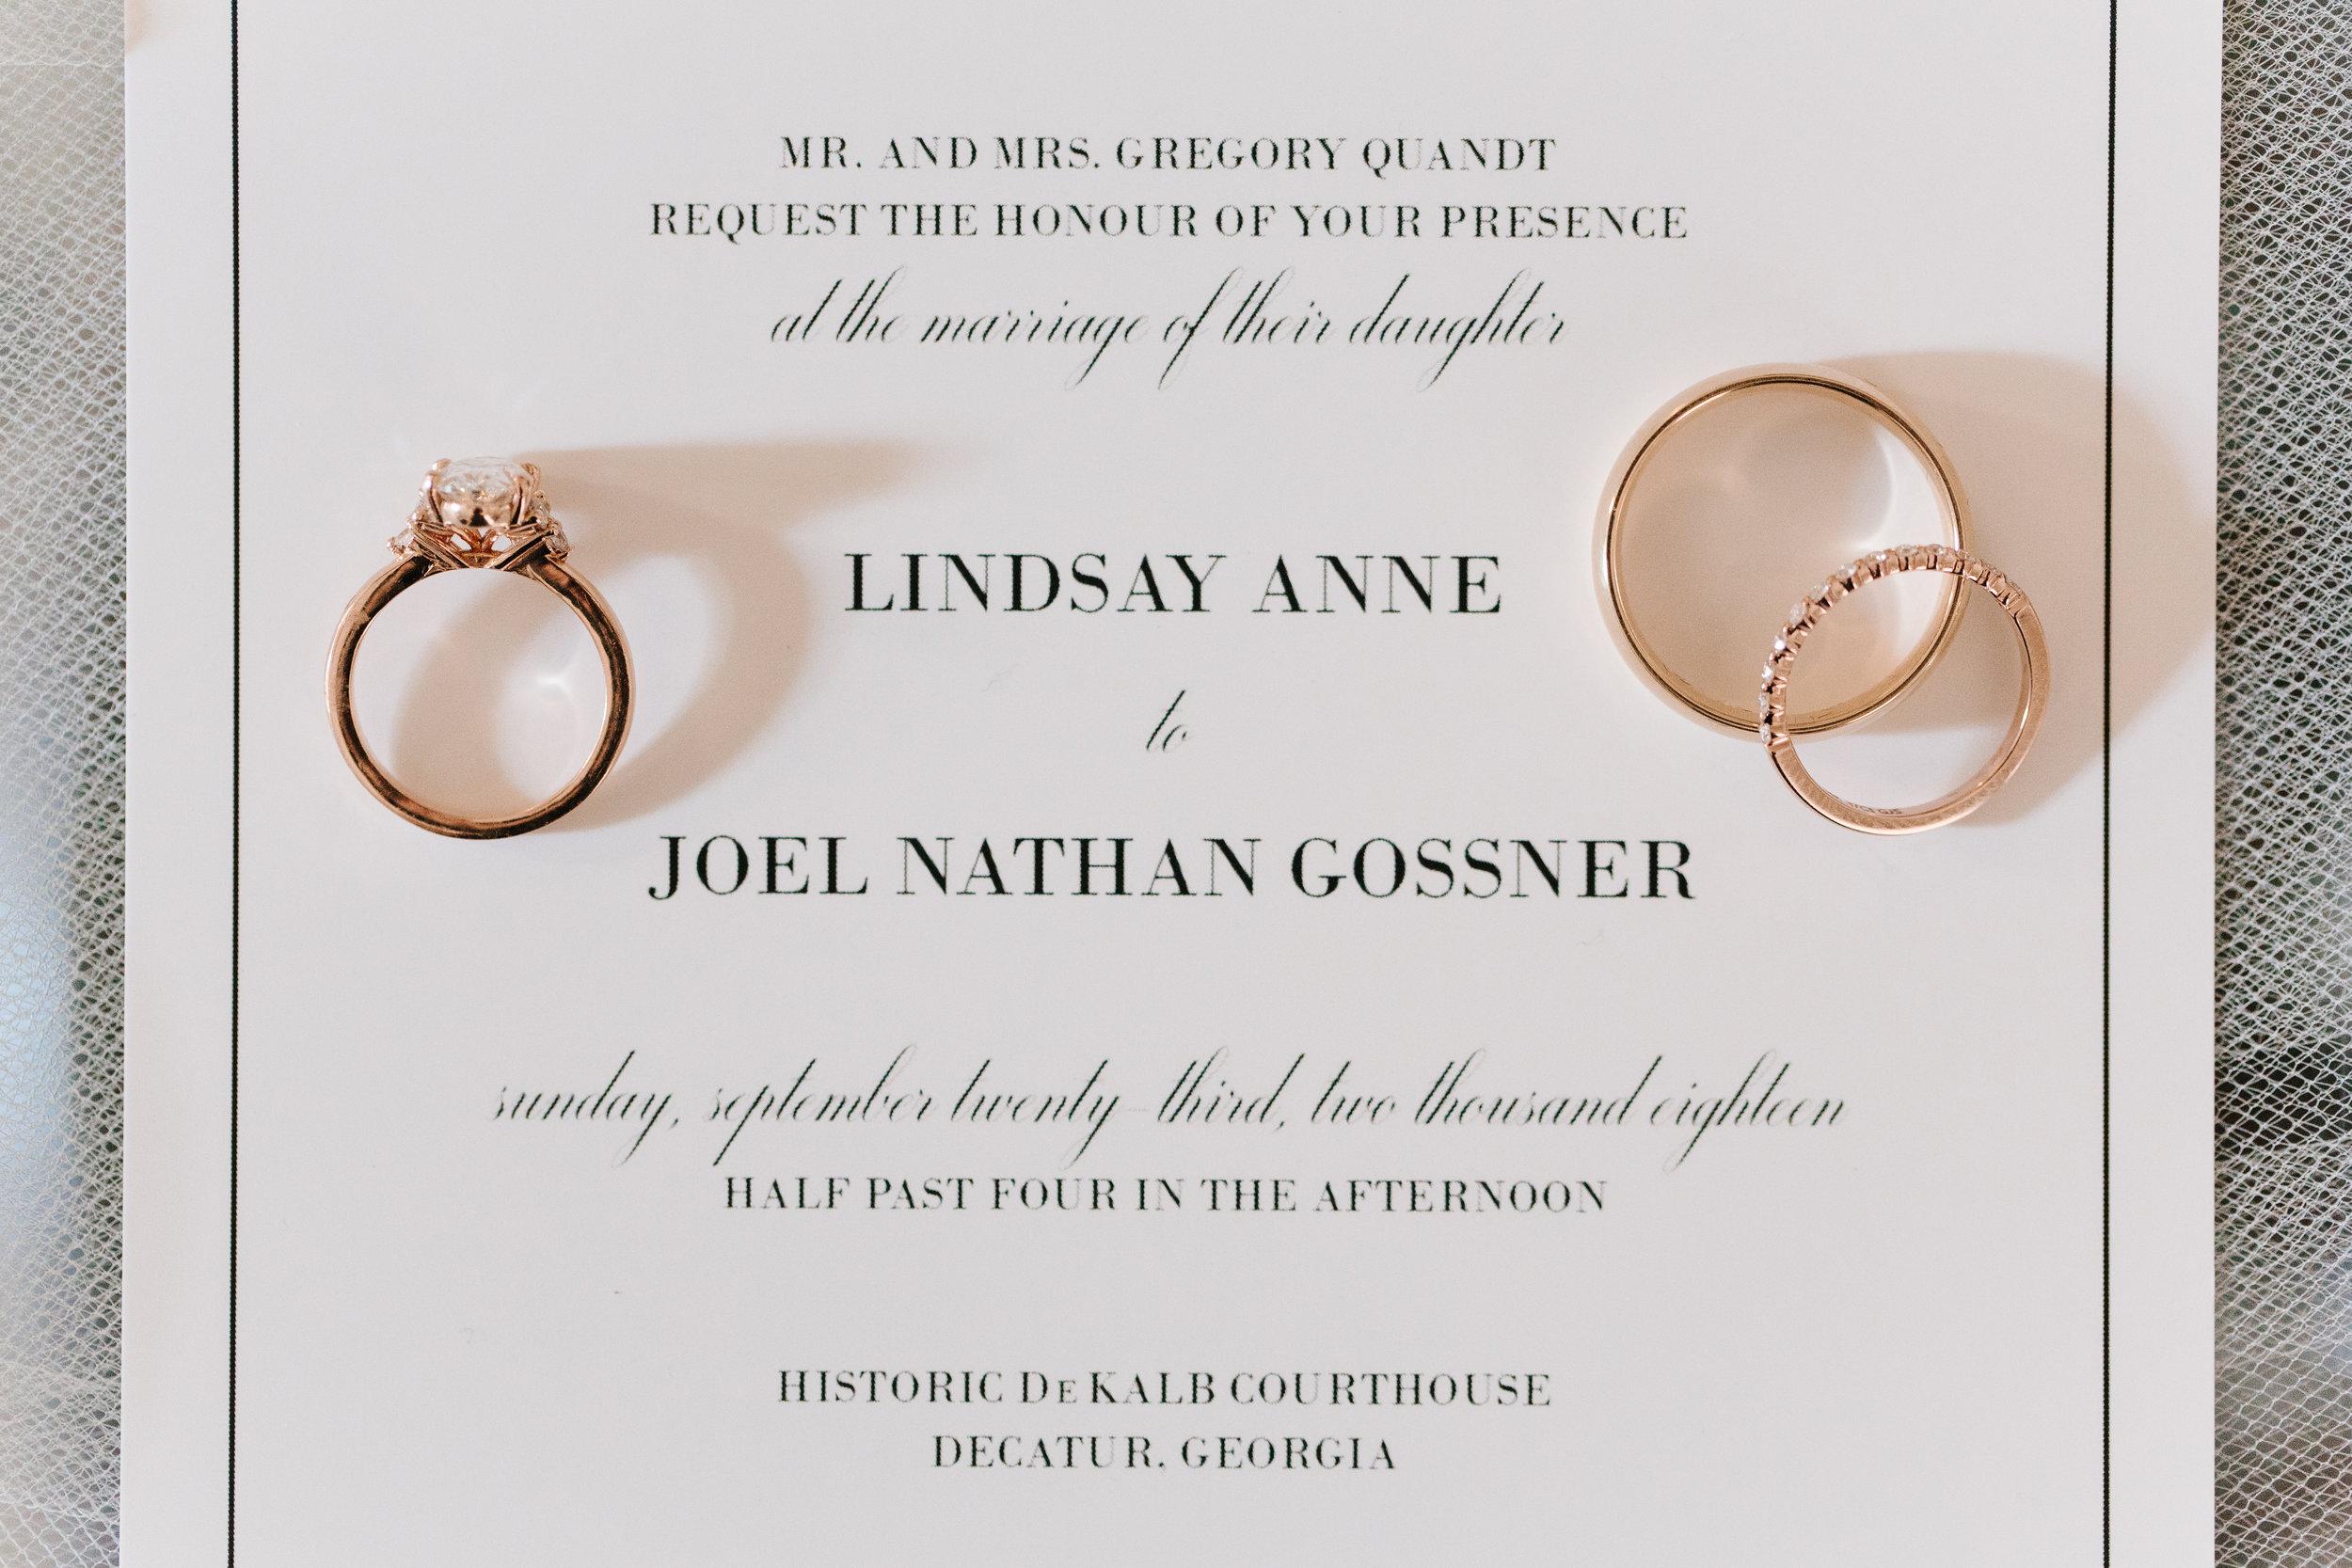 lindsay_joel_wedding-5.jpg